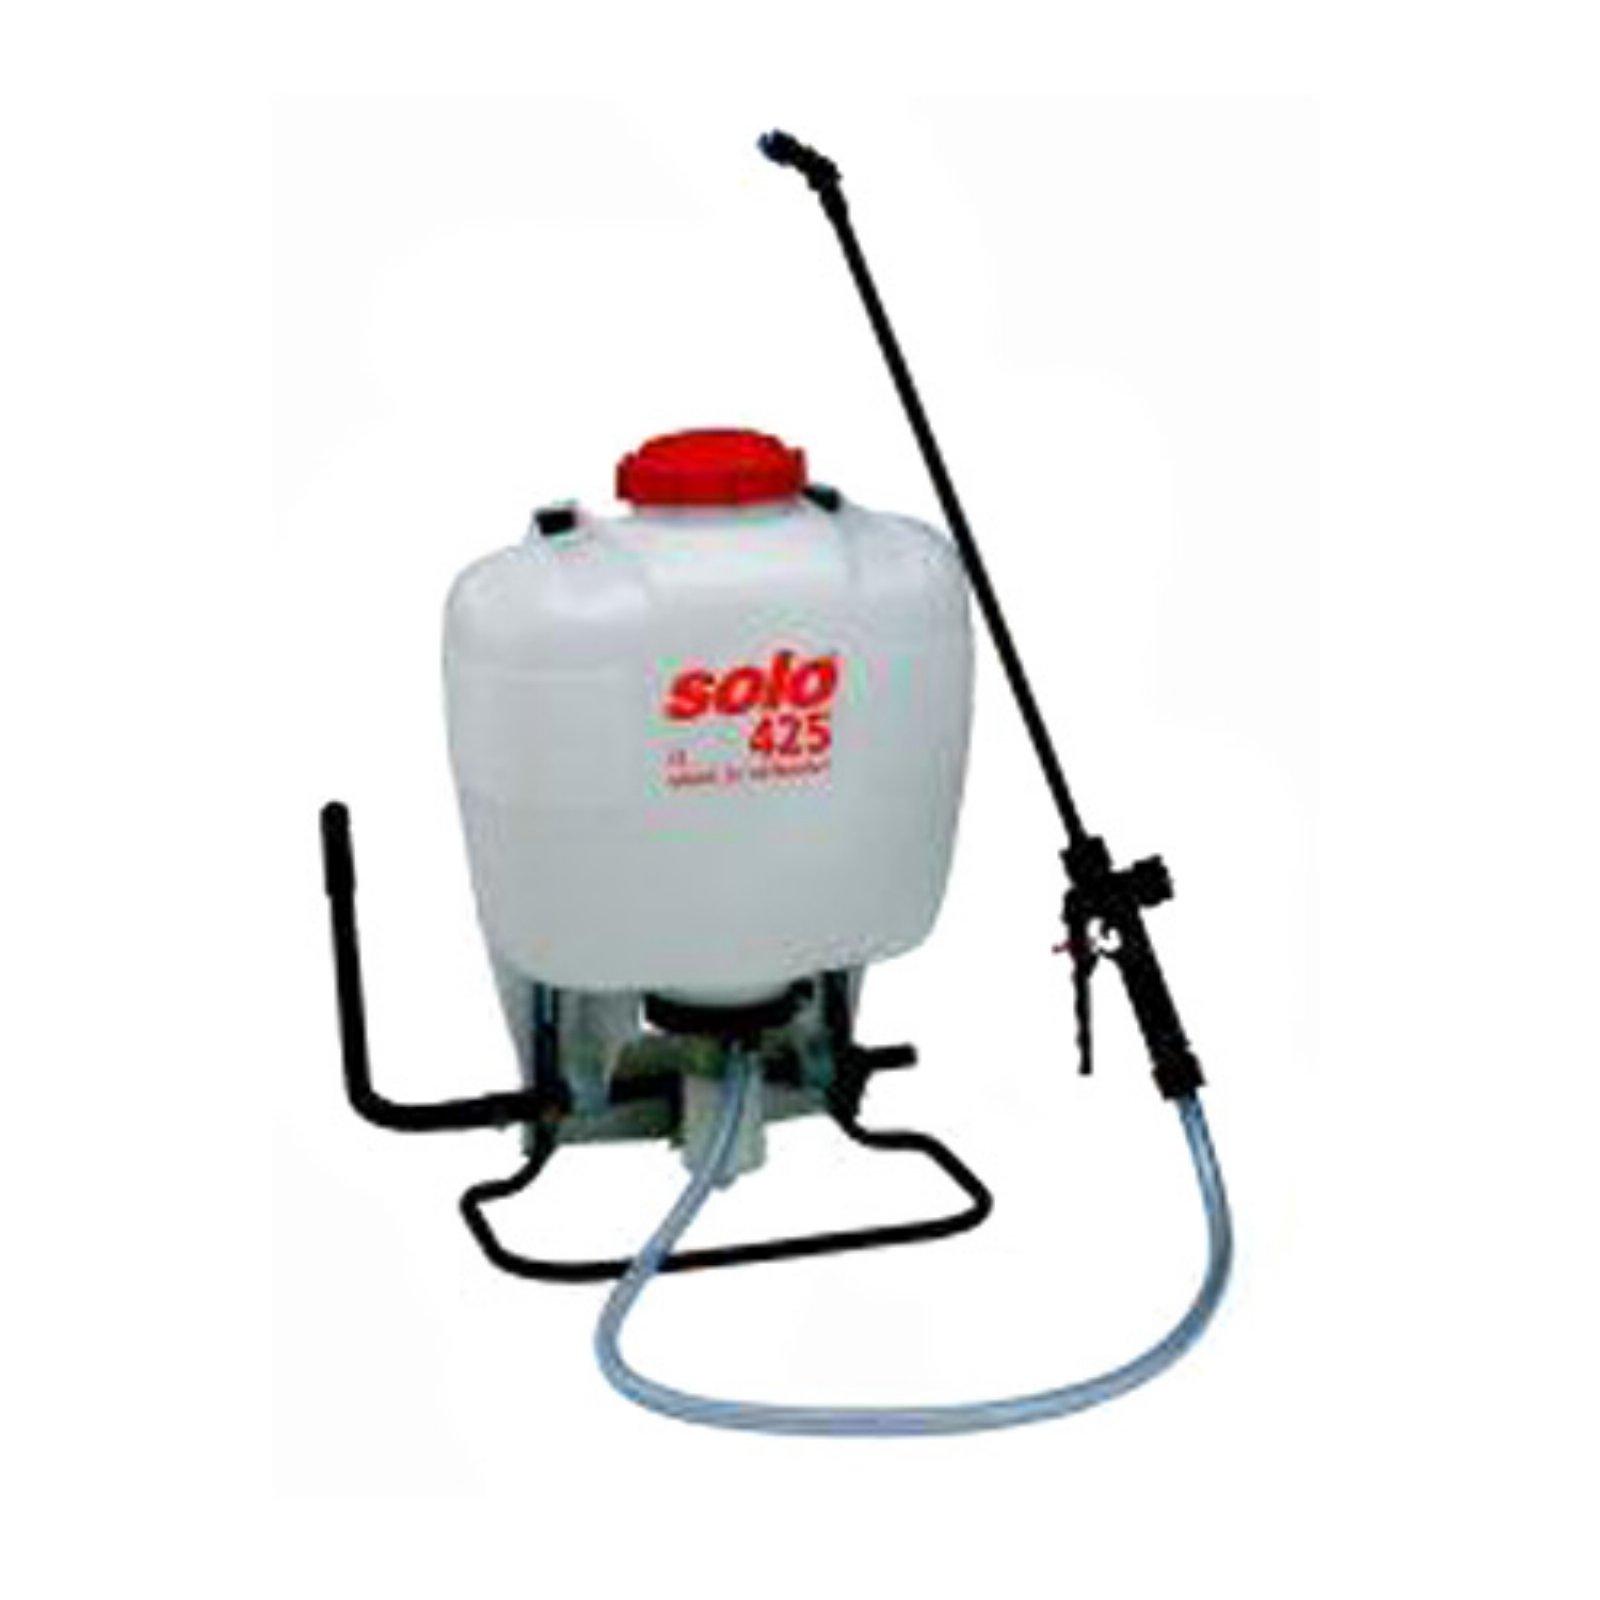 Solo 4 Gallon Backpack Sprayer Piston Pump by Solo Motors